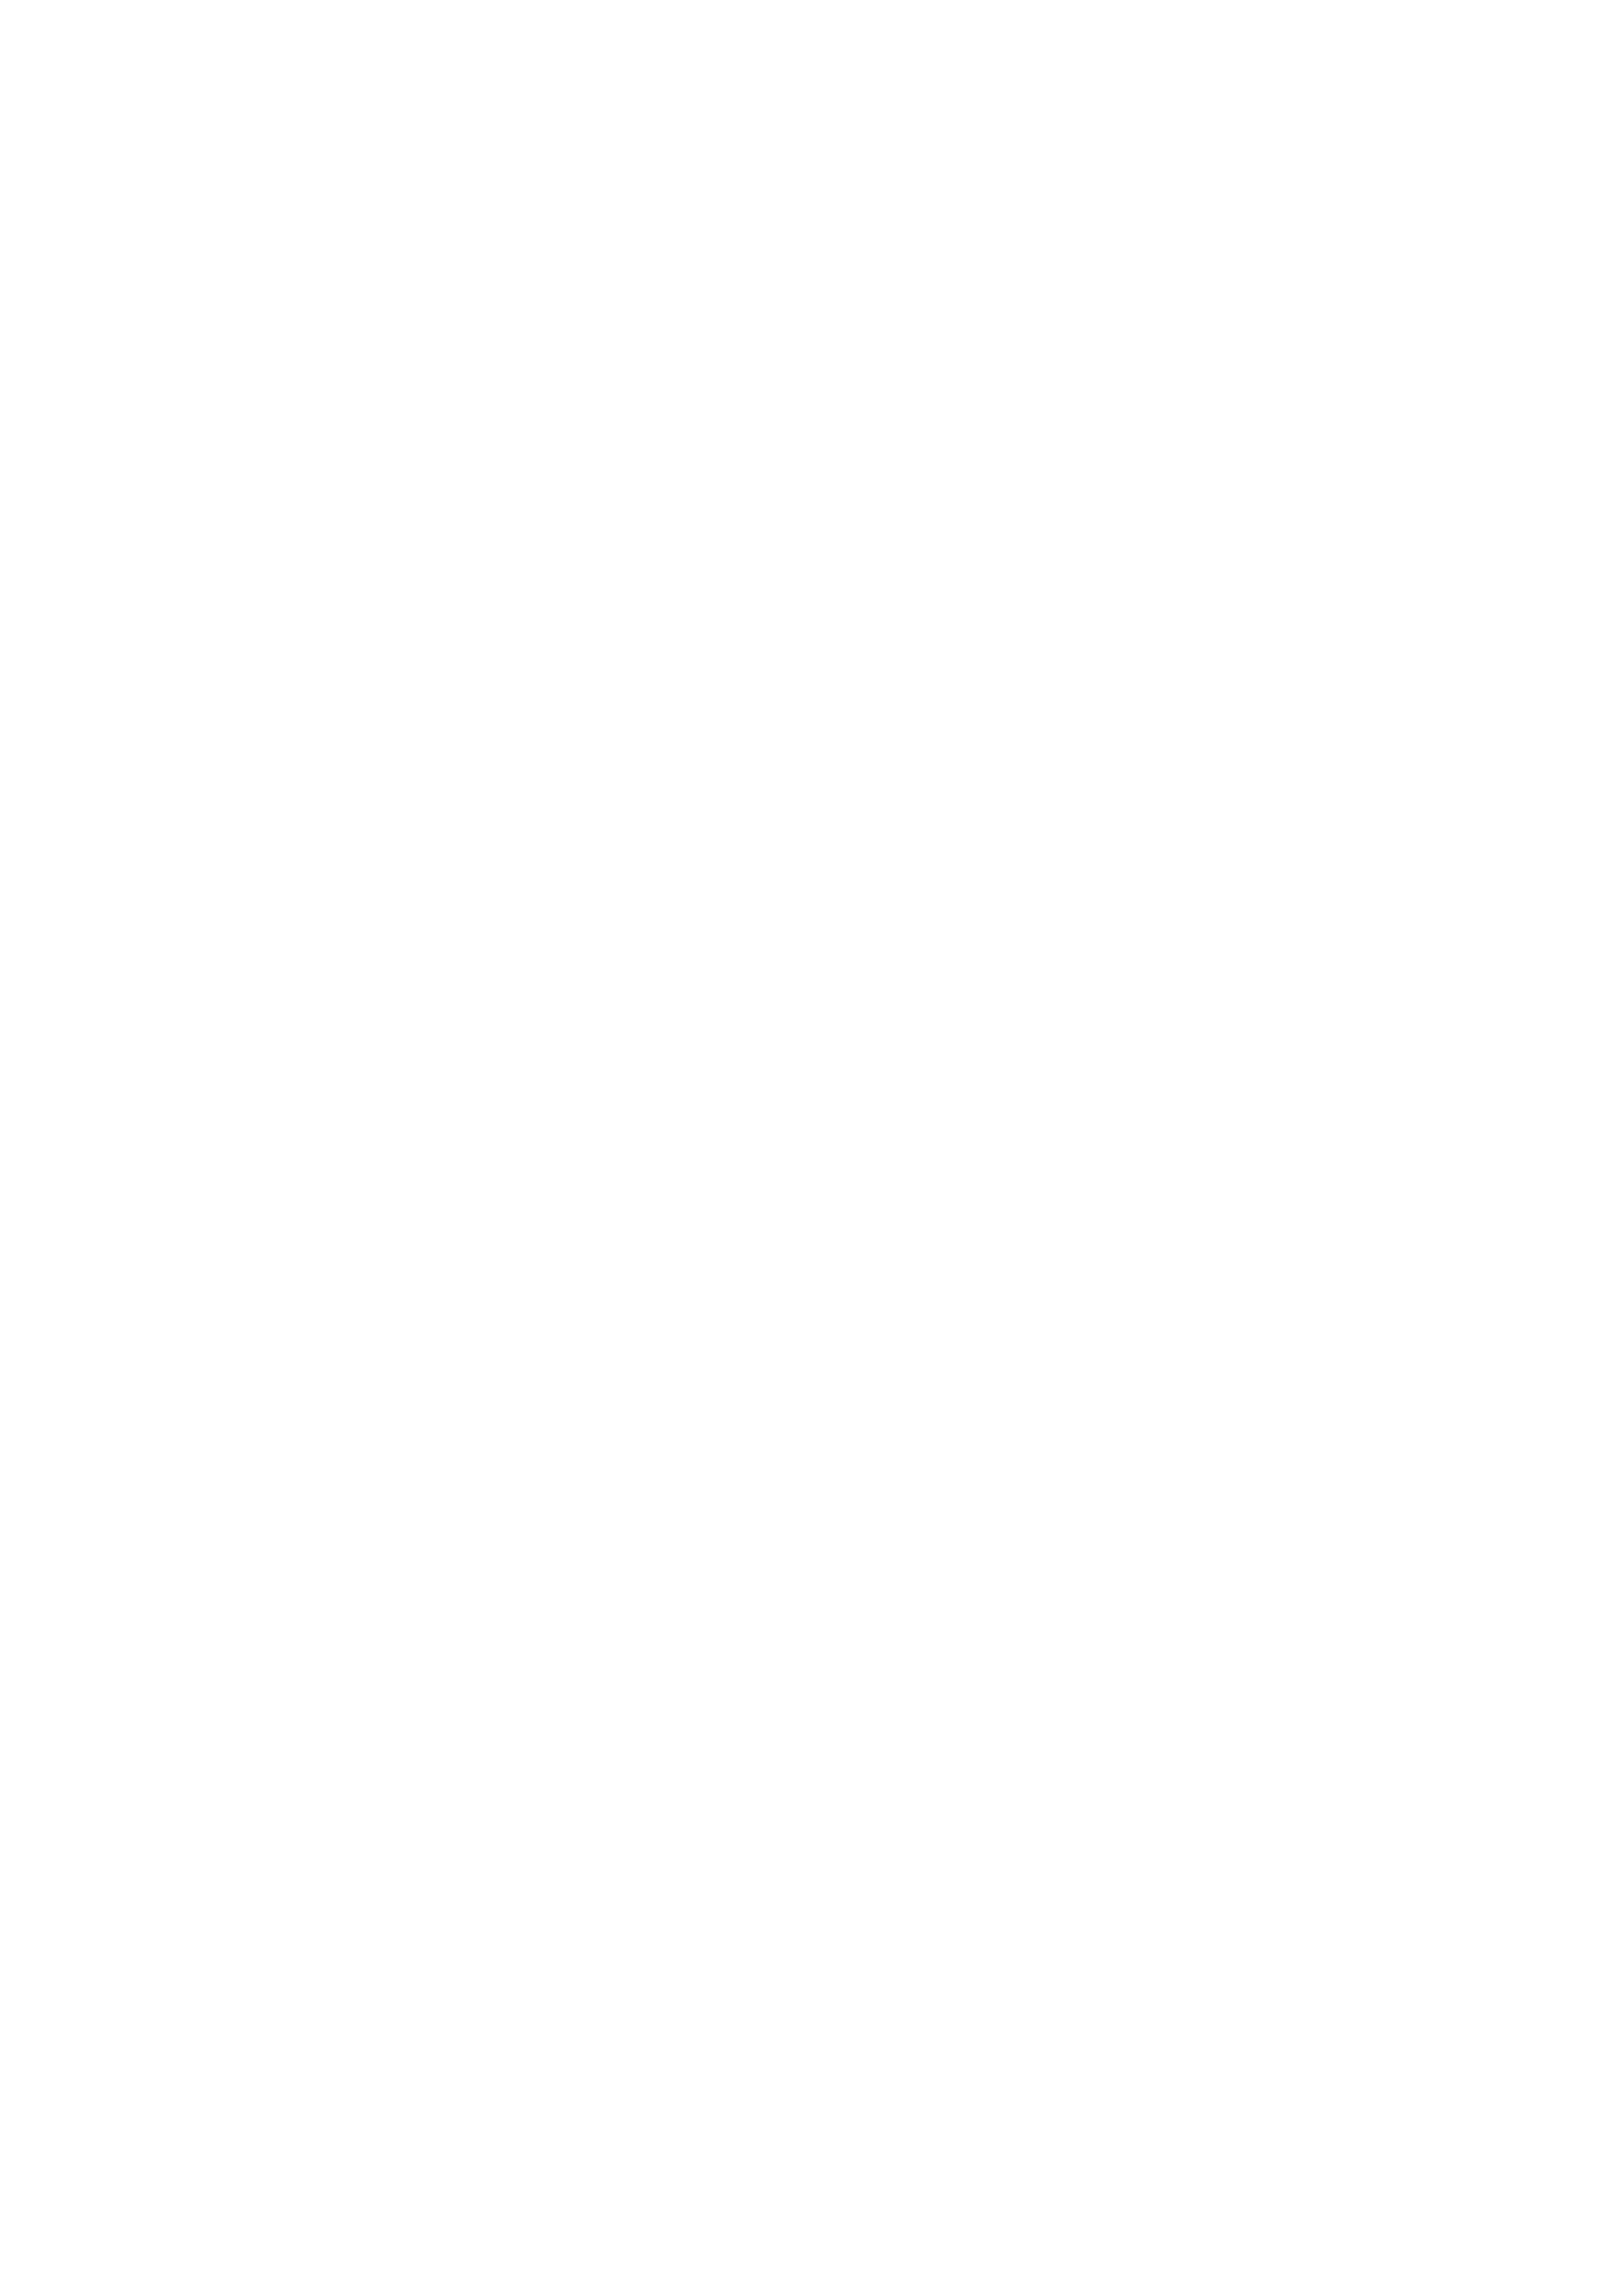 Snowflake deco frame transparent. Snowflakes border png